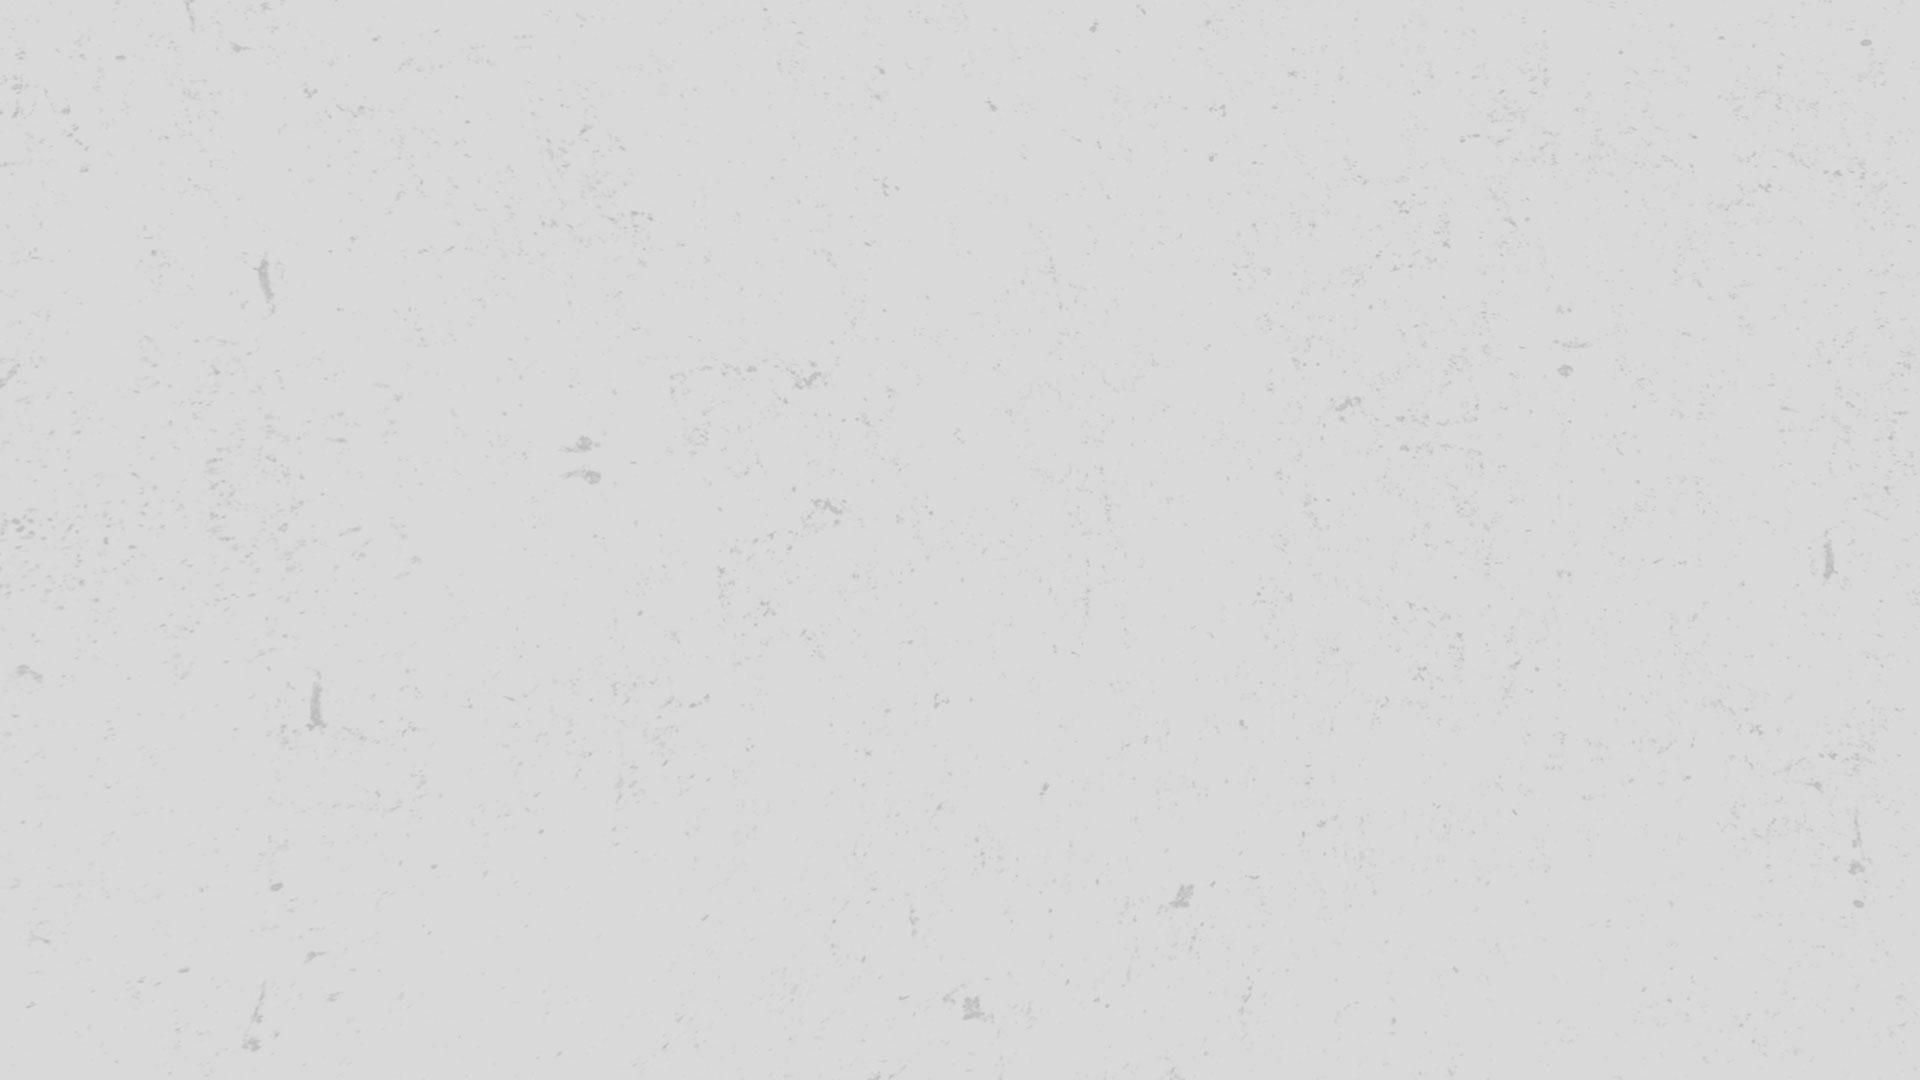 flowhynot-i-am-illustrailer-1920x1080-bckgrd